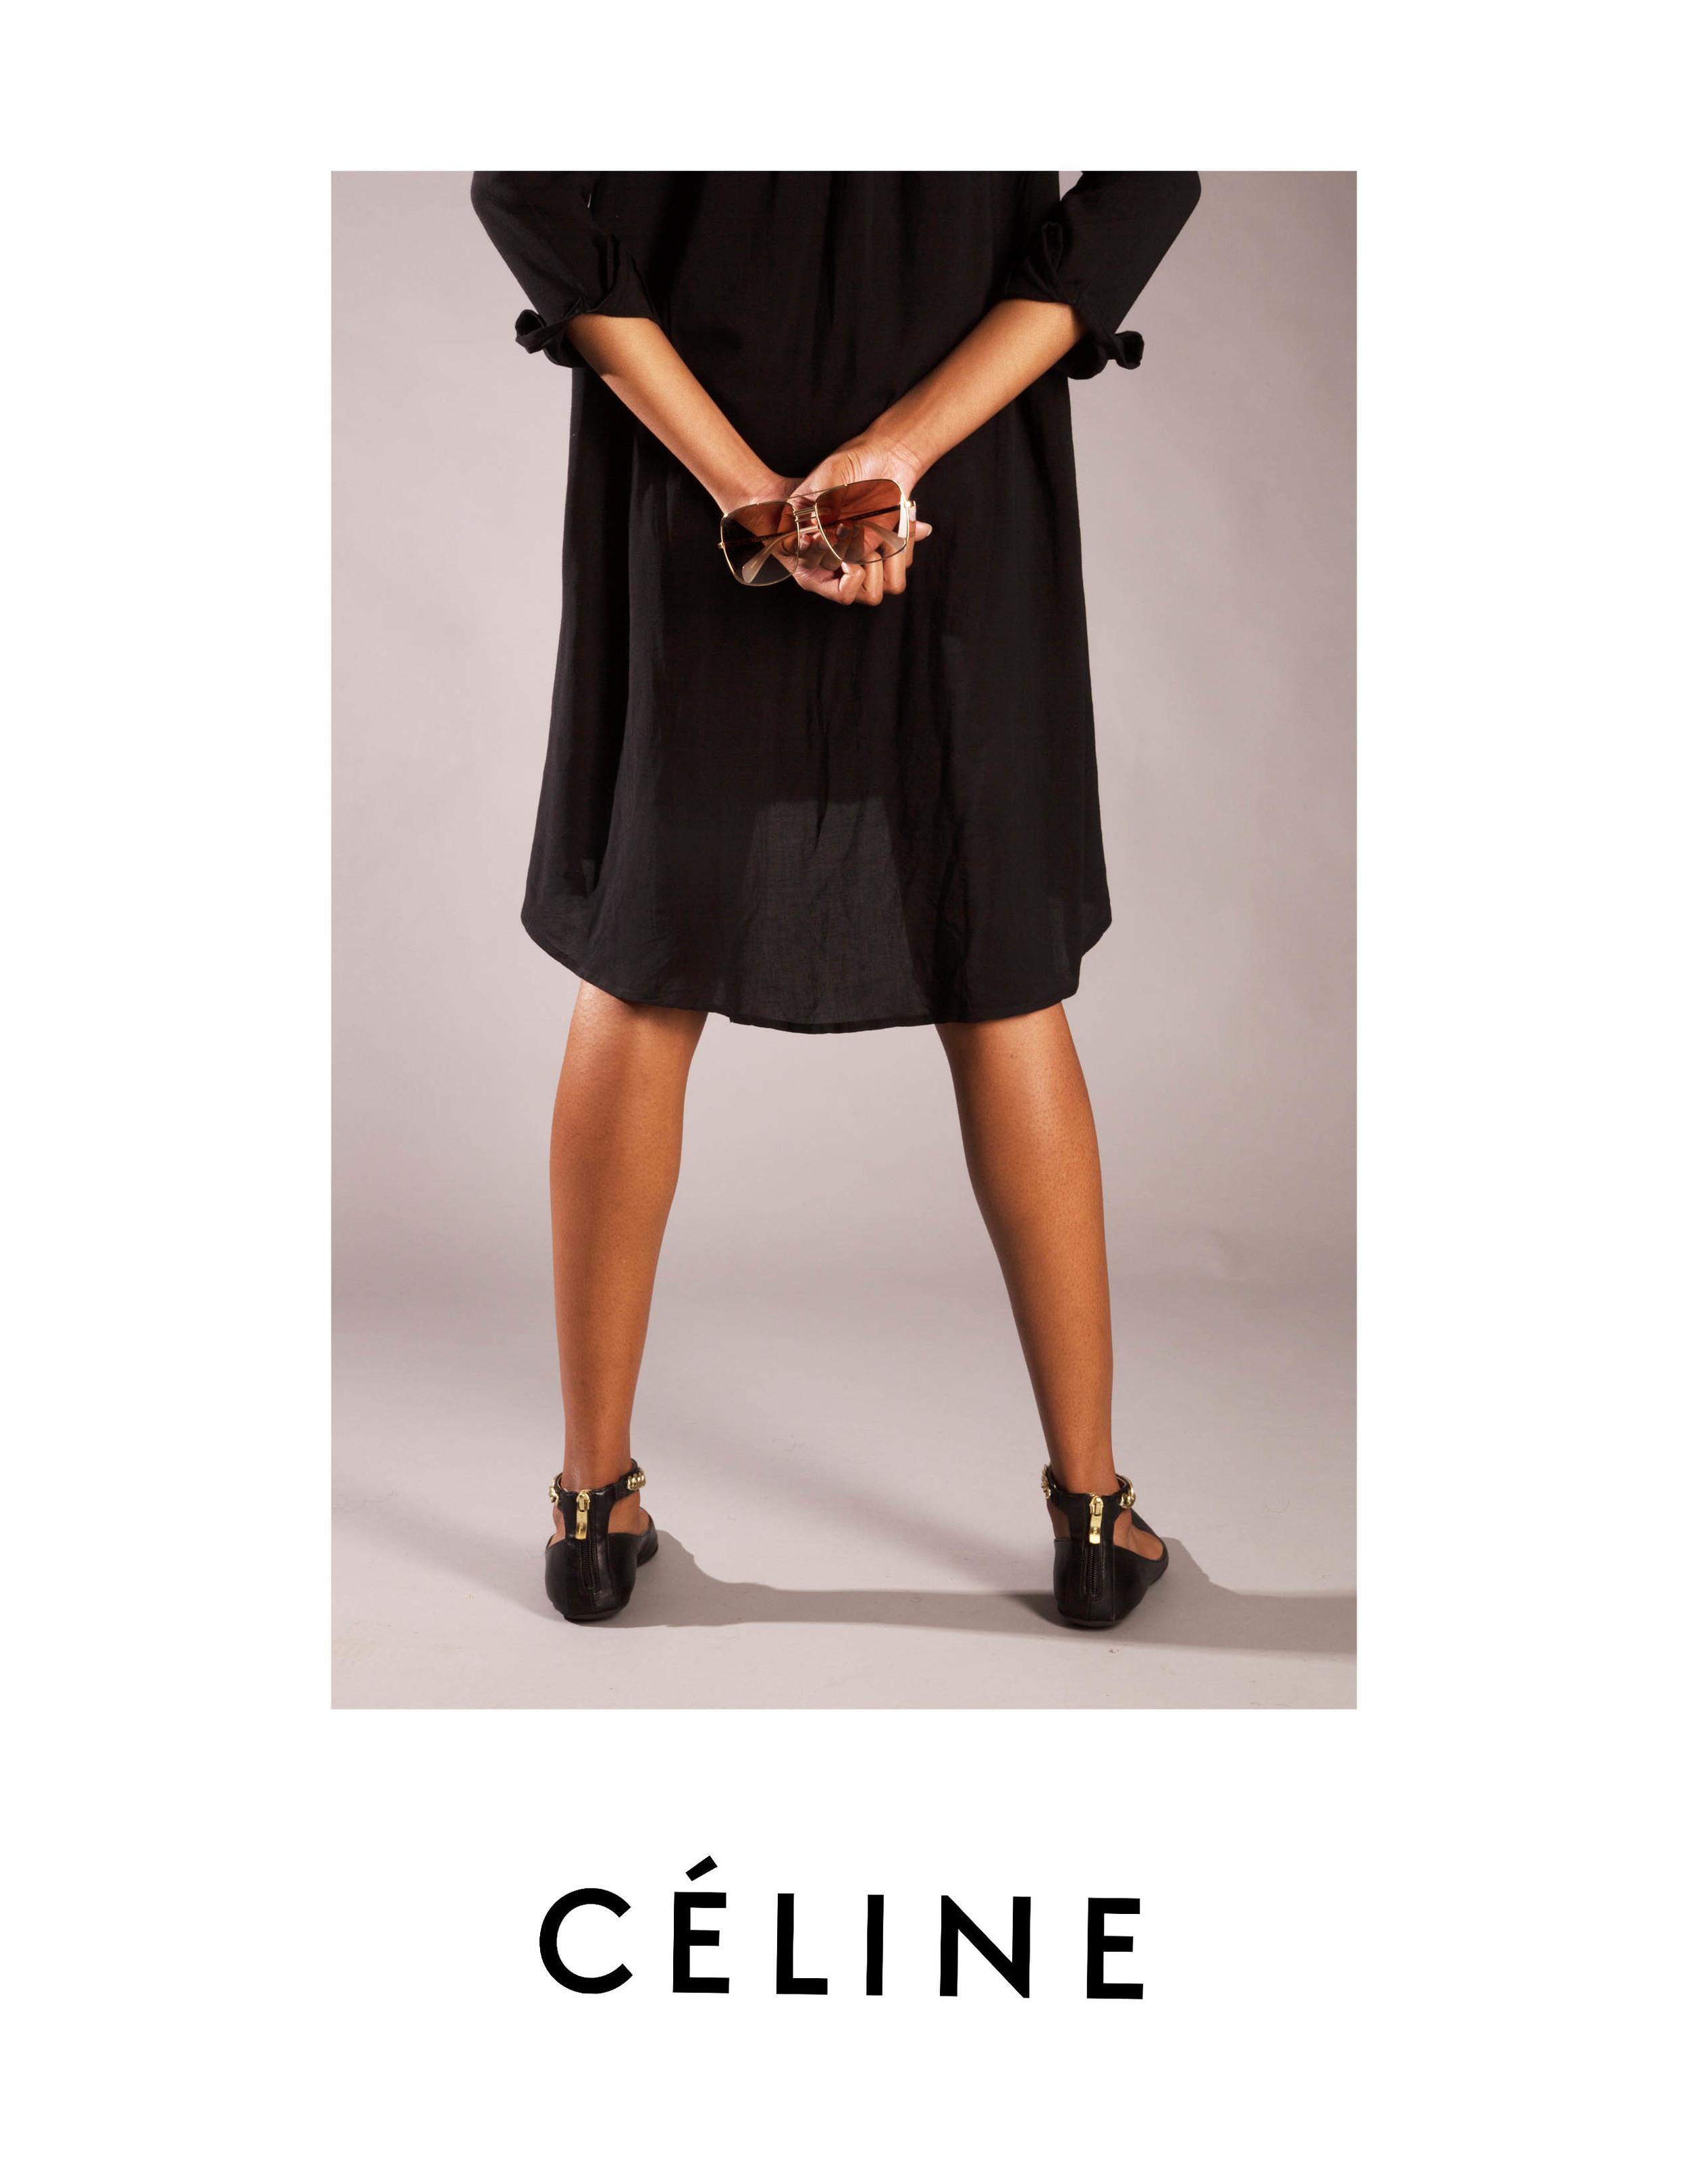 Celine_02.jpg